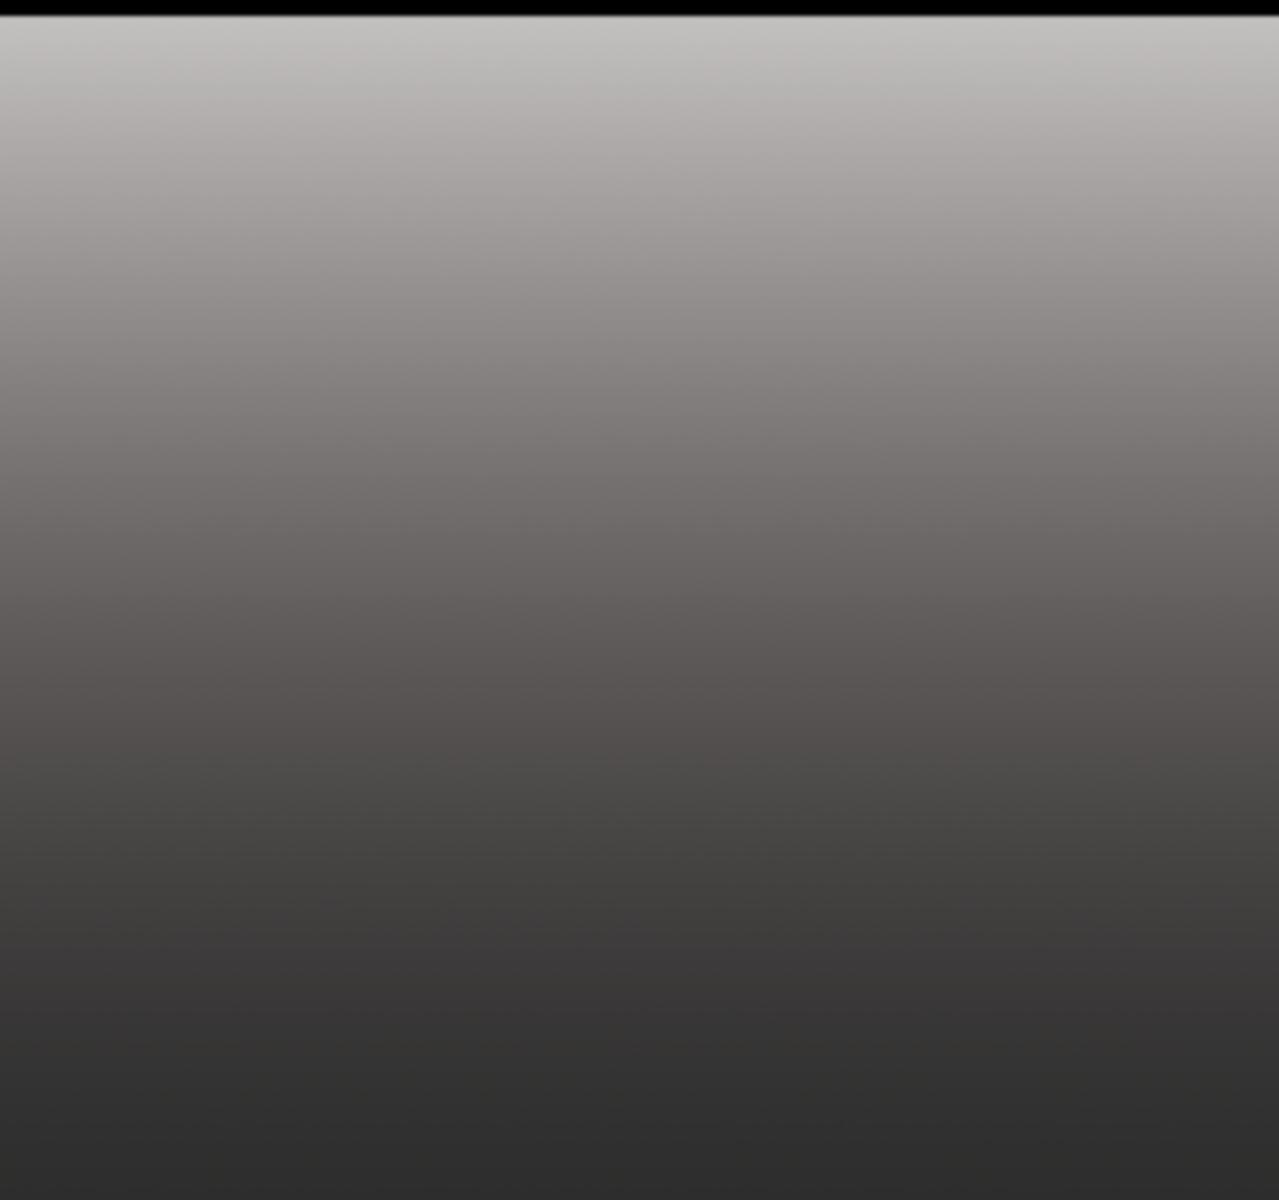 gradient-down.png